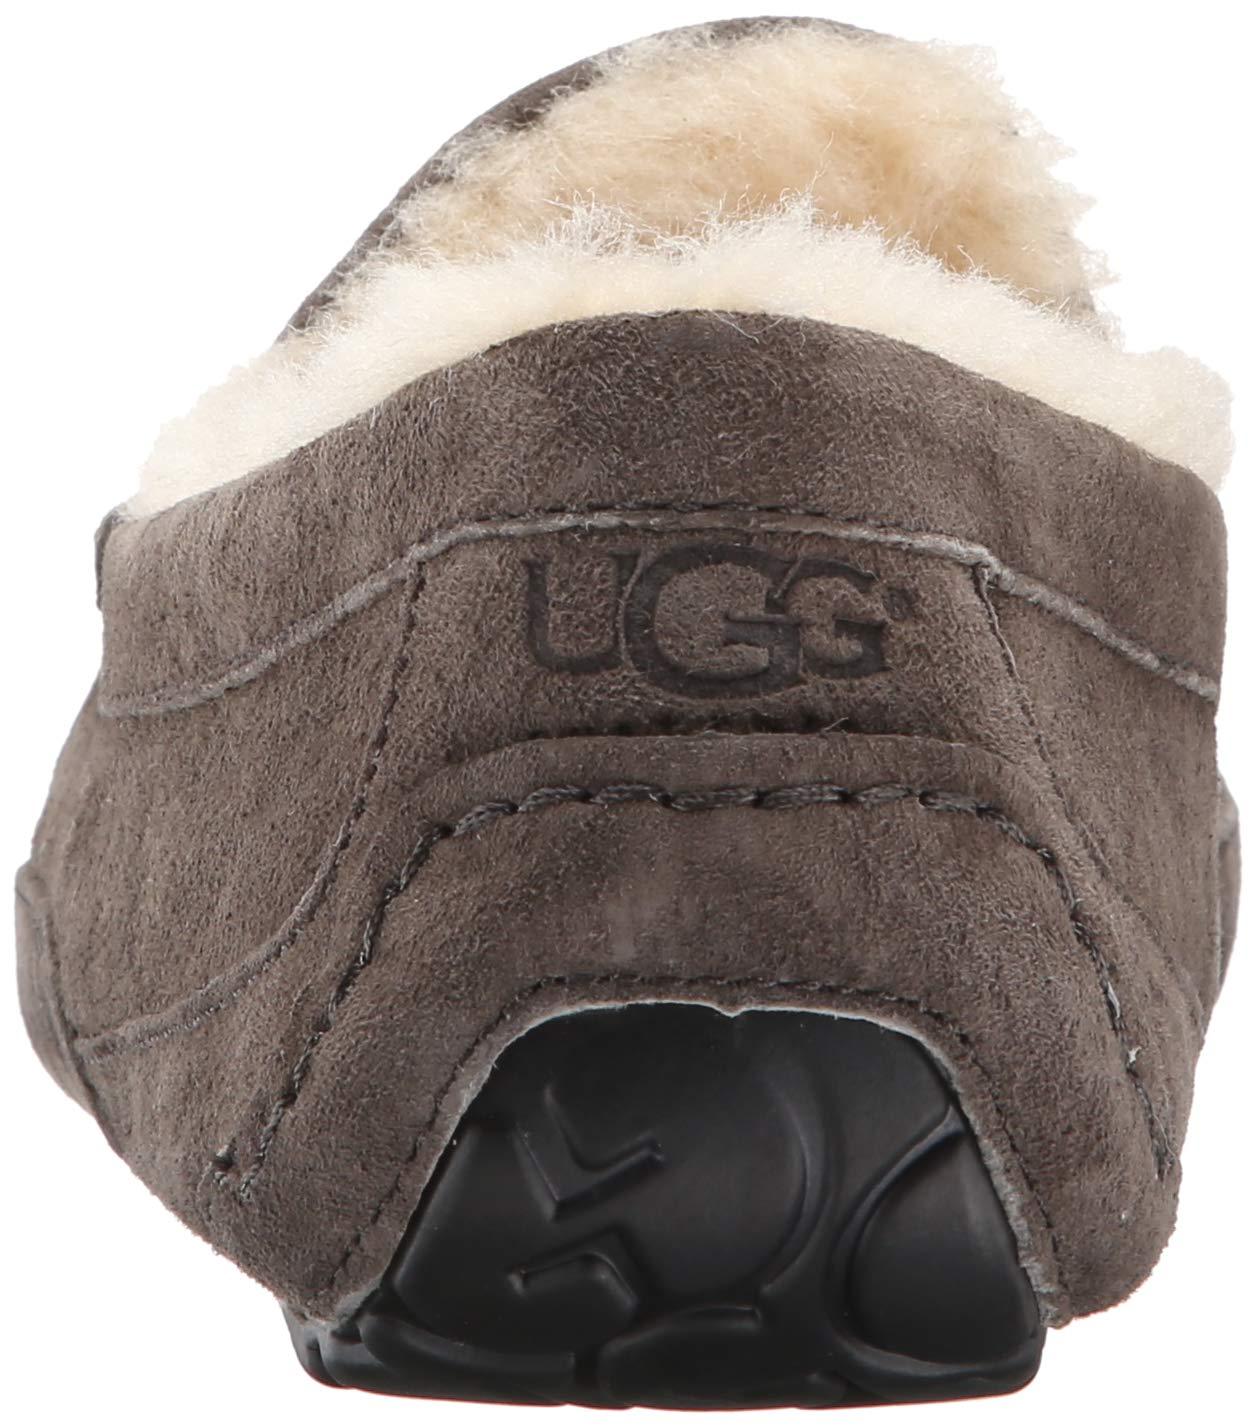 UGG Men's Ascot Slipper, Charcoal, 12 M US by UGG (Image #2)